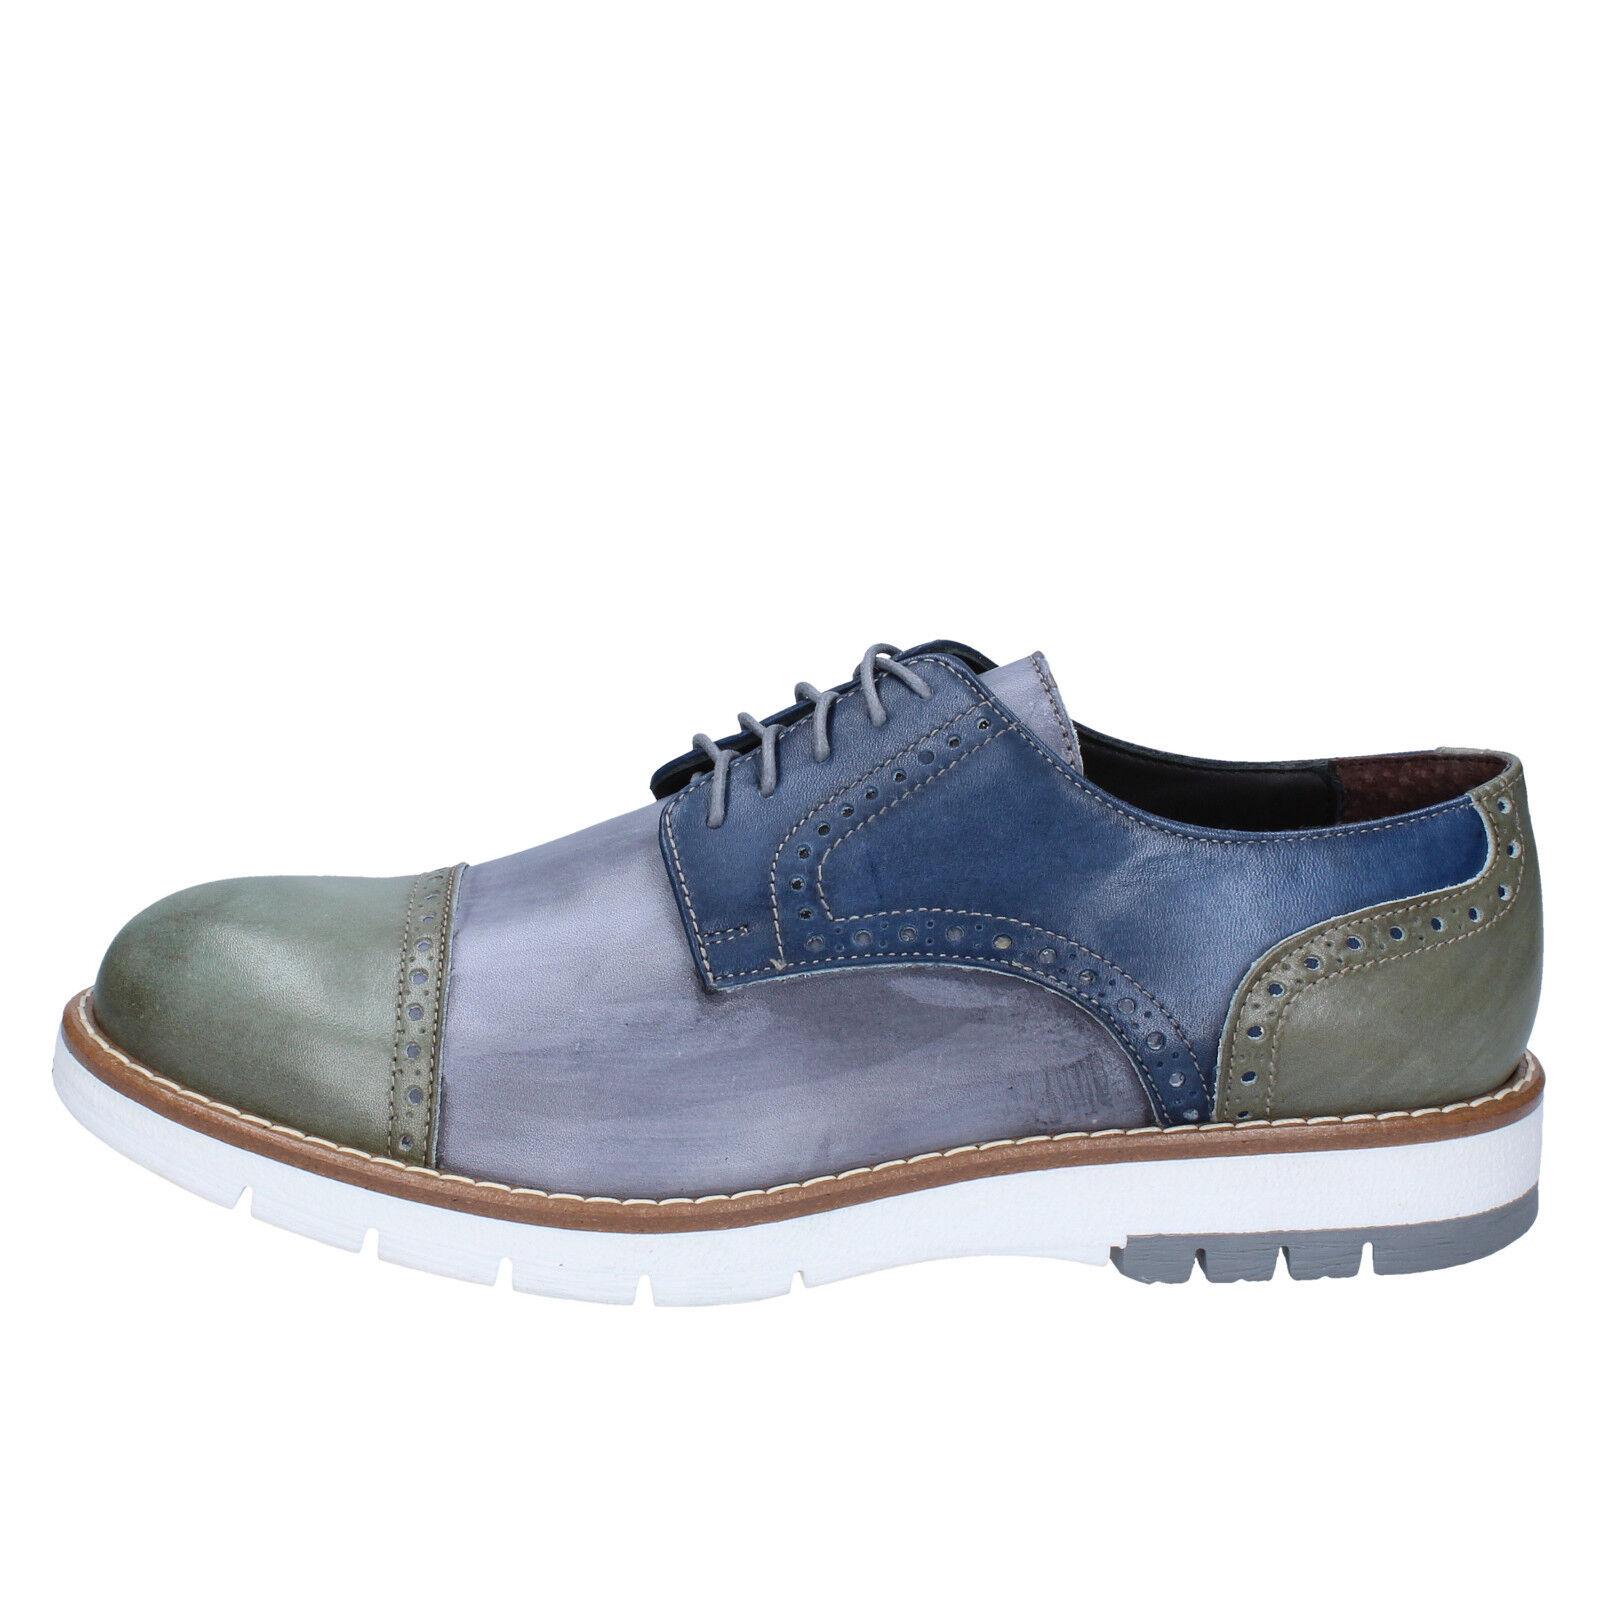 men's shoes DI MELLA 10 () elegant blue gray leather BZ41-D